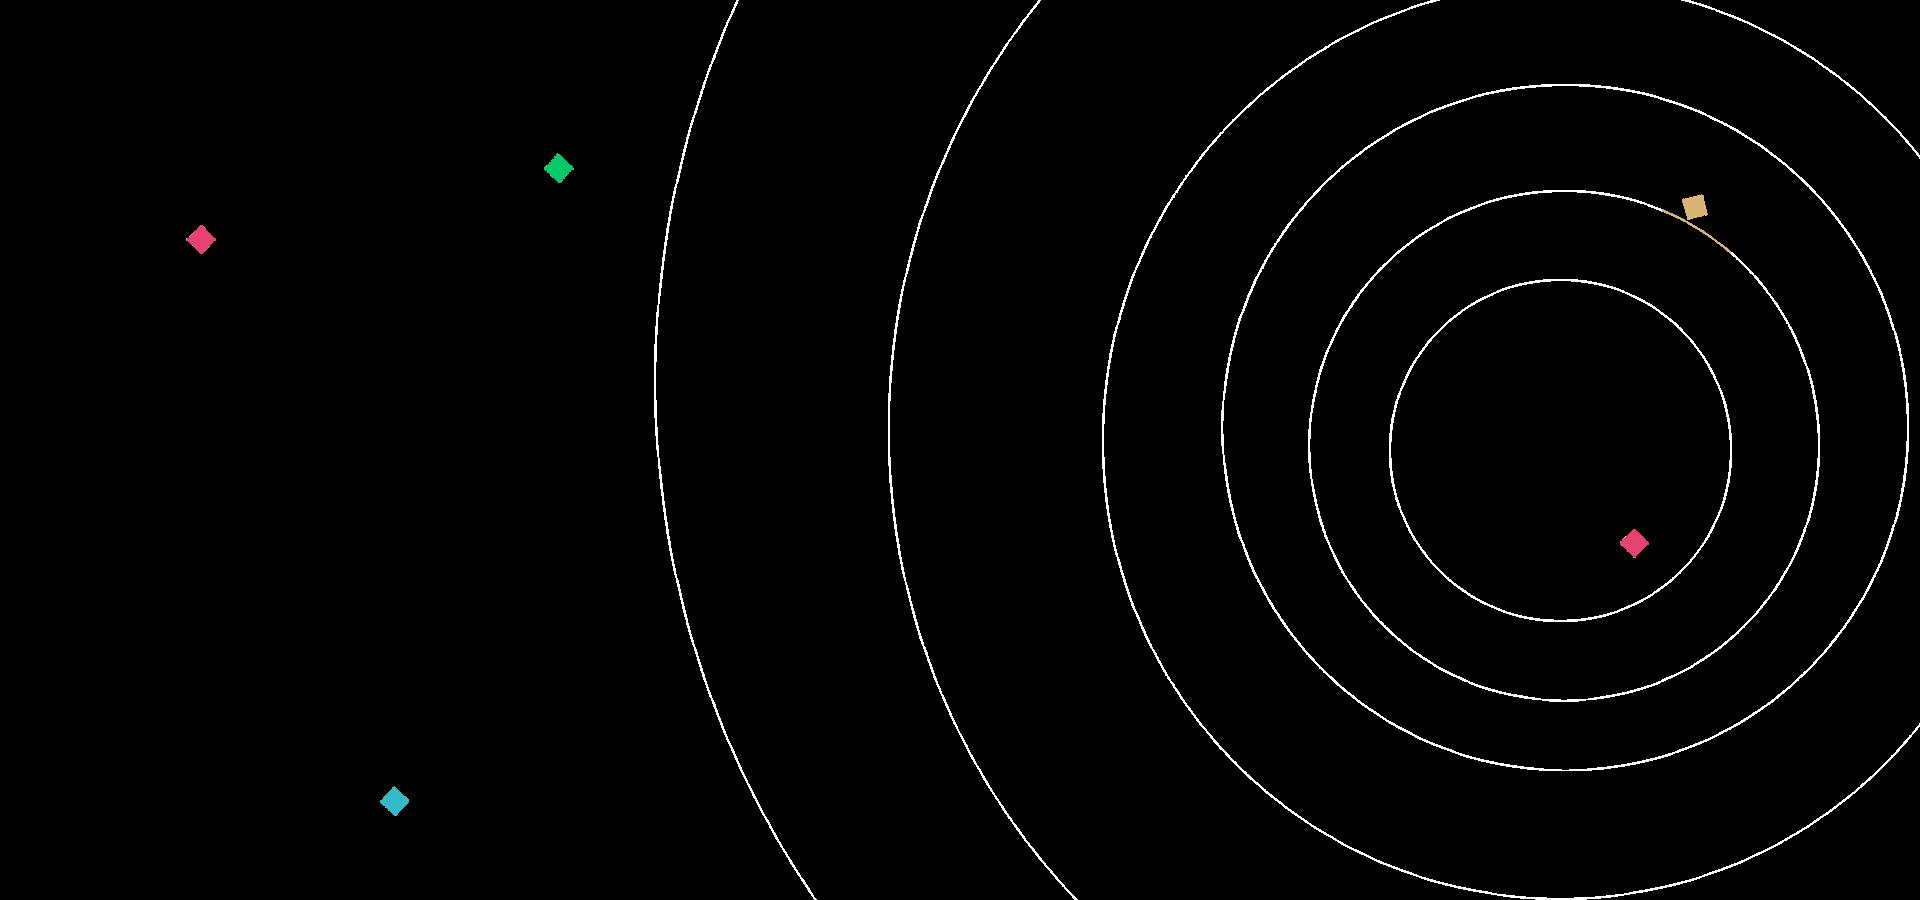 pattern_background2